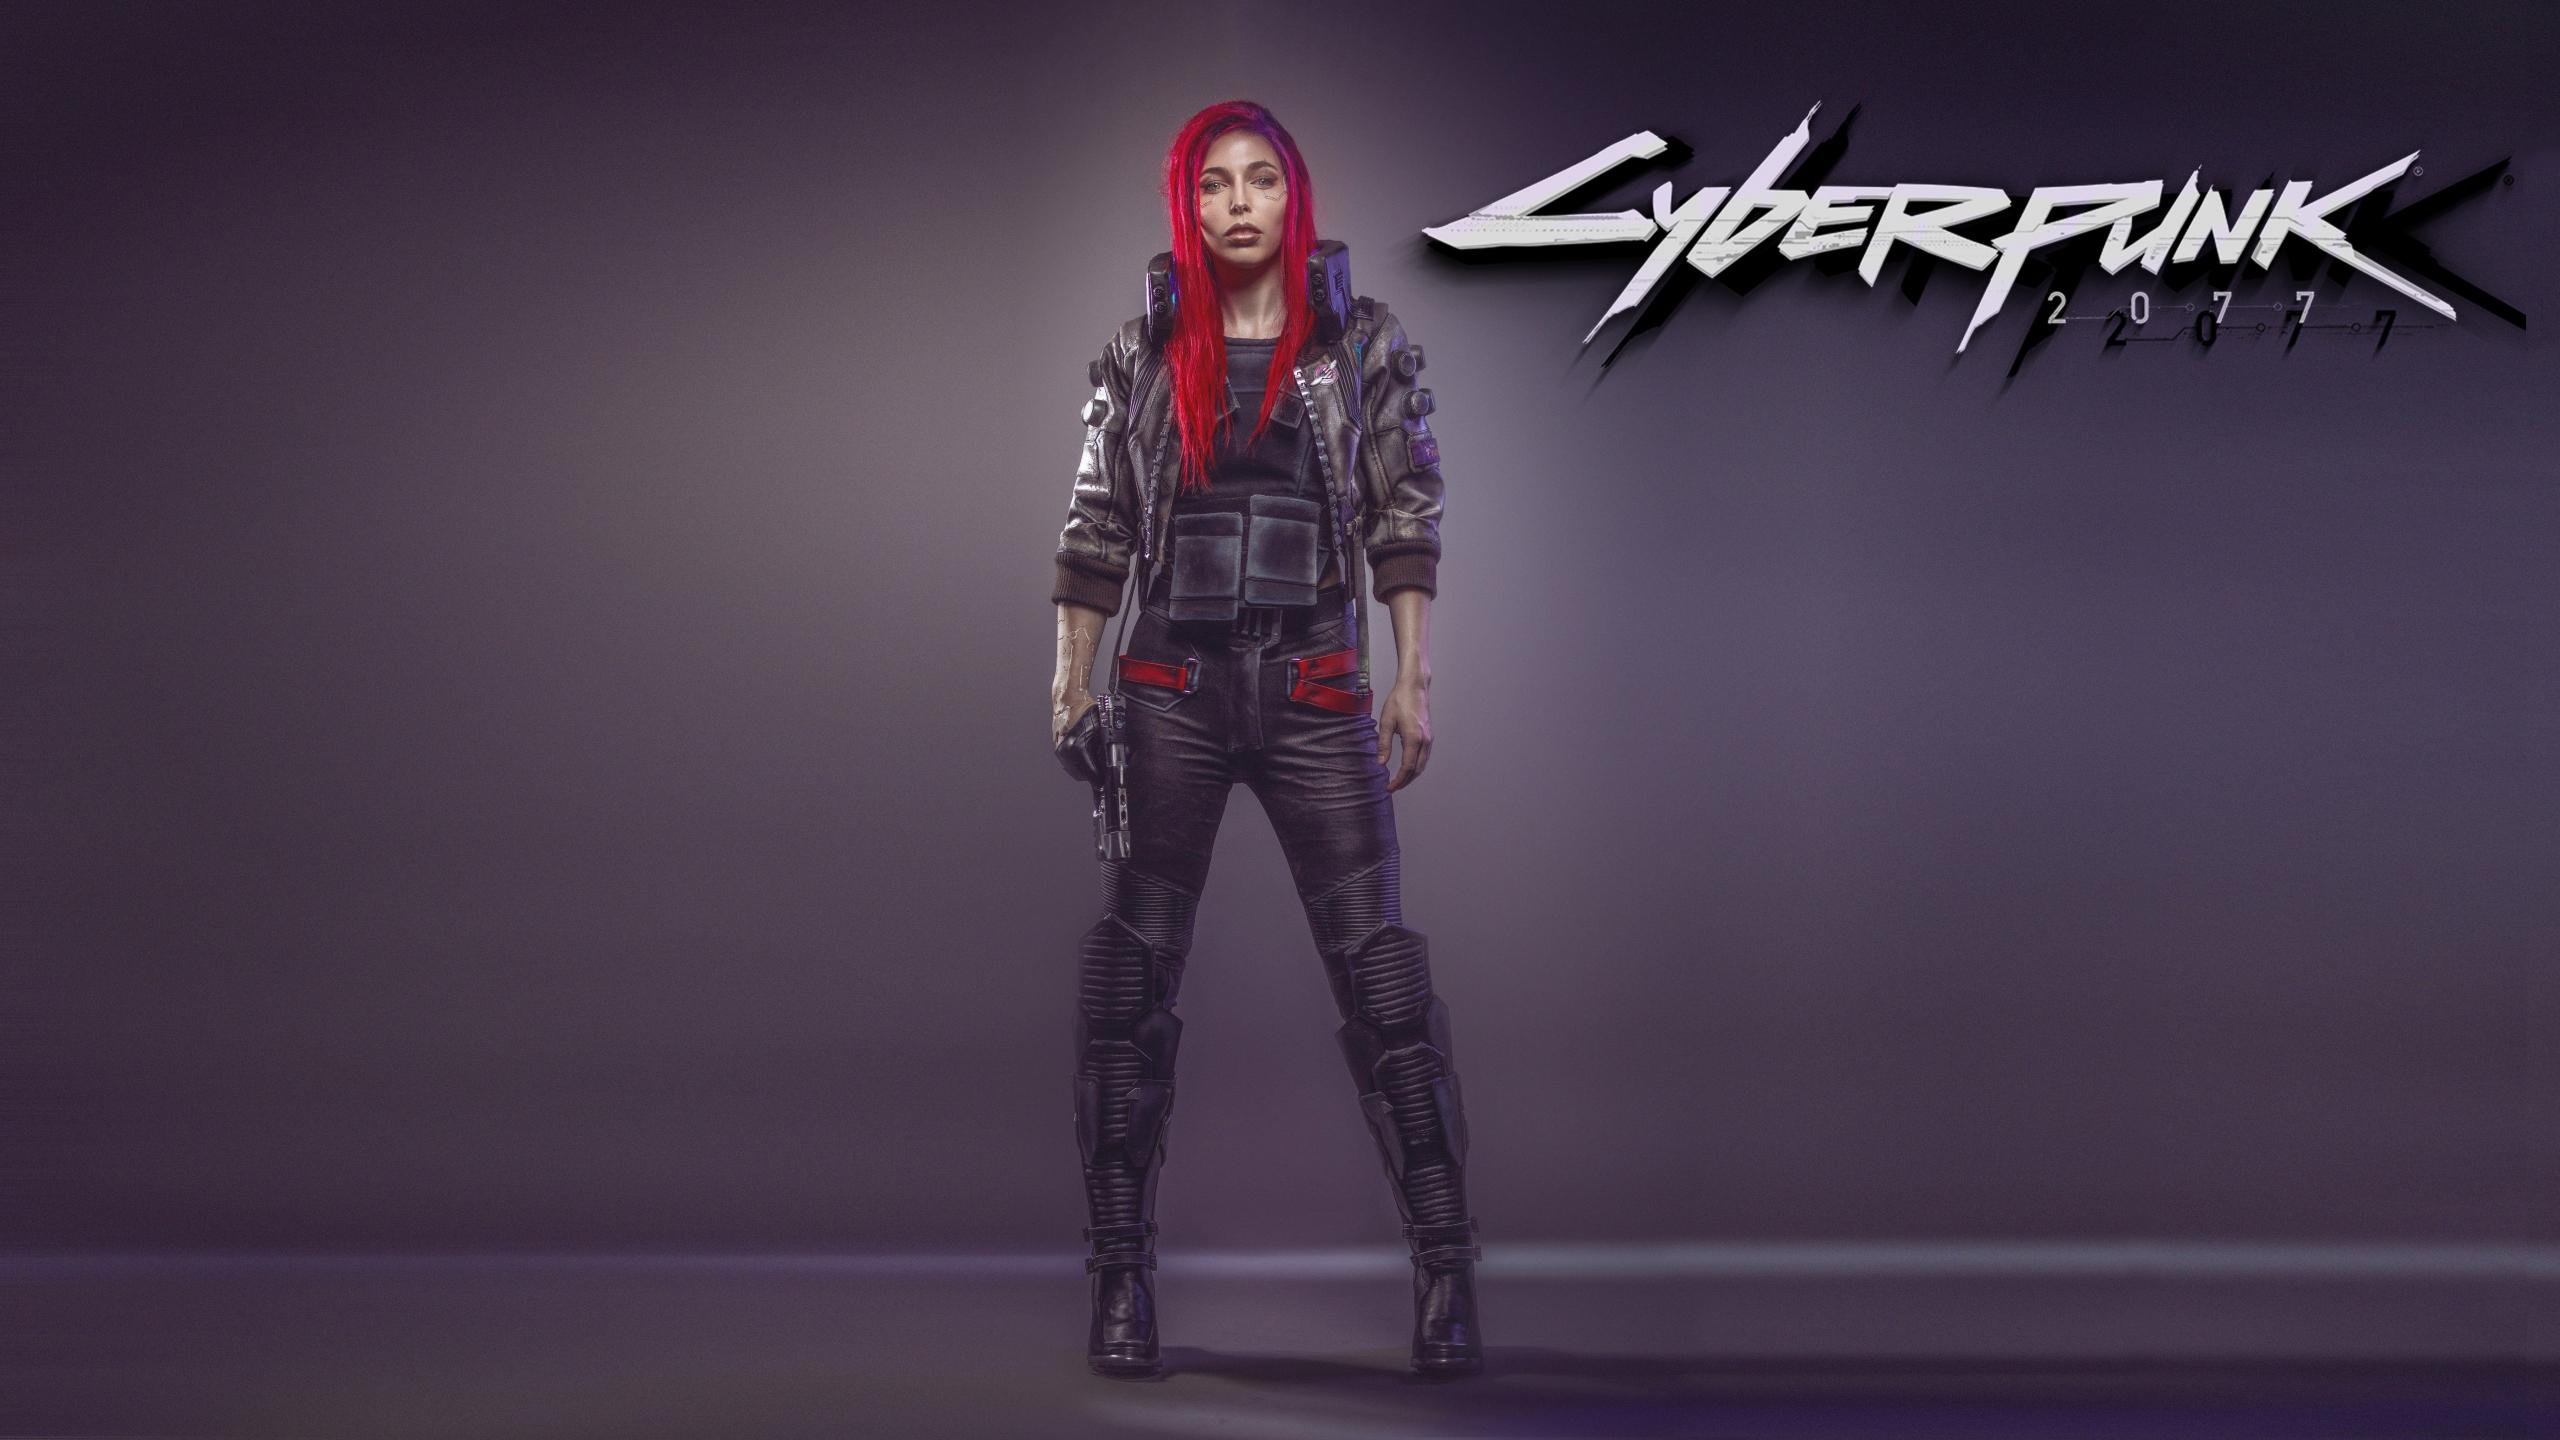 Download 2560x1440 Wallpaper Cyberpunk 2077 Woman Red Head Video Game Dual Wide Widescreen 16 9 Widescreen 2560x1440 Hd Image Background 9292